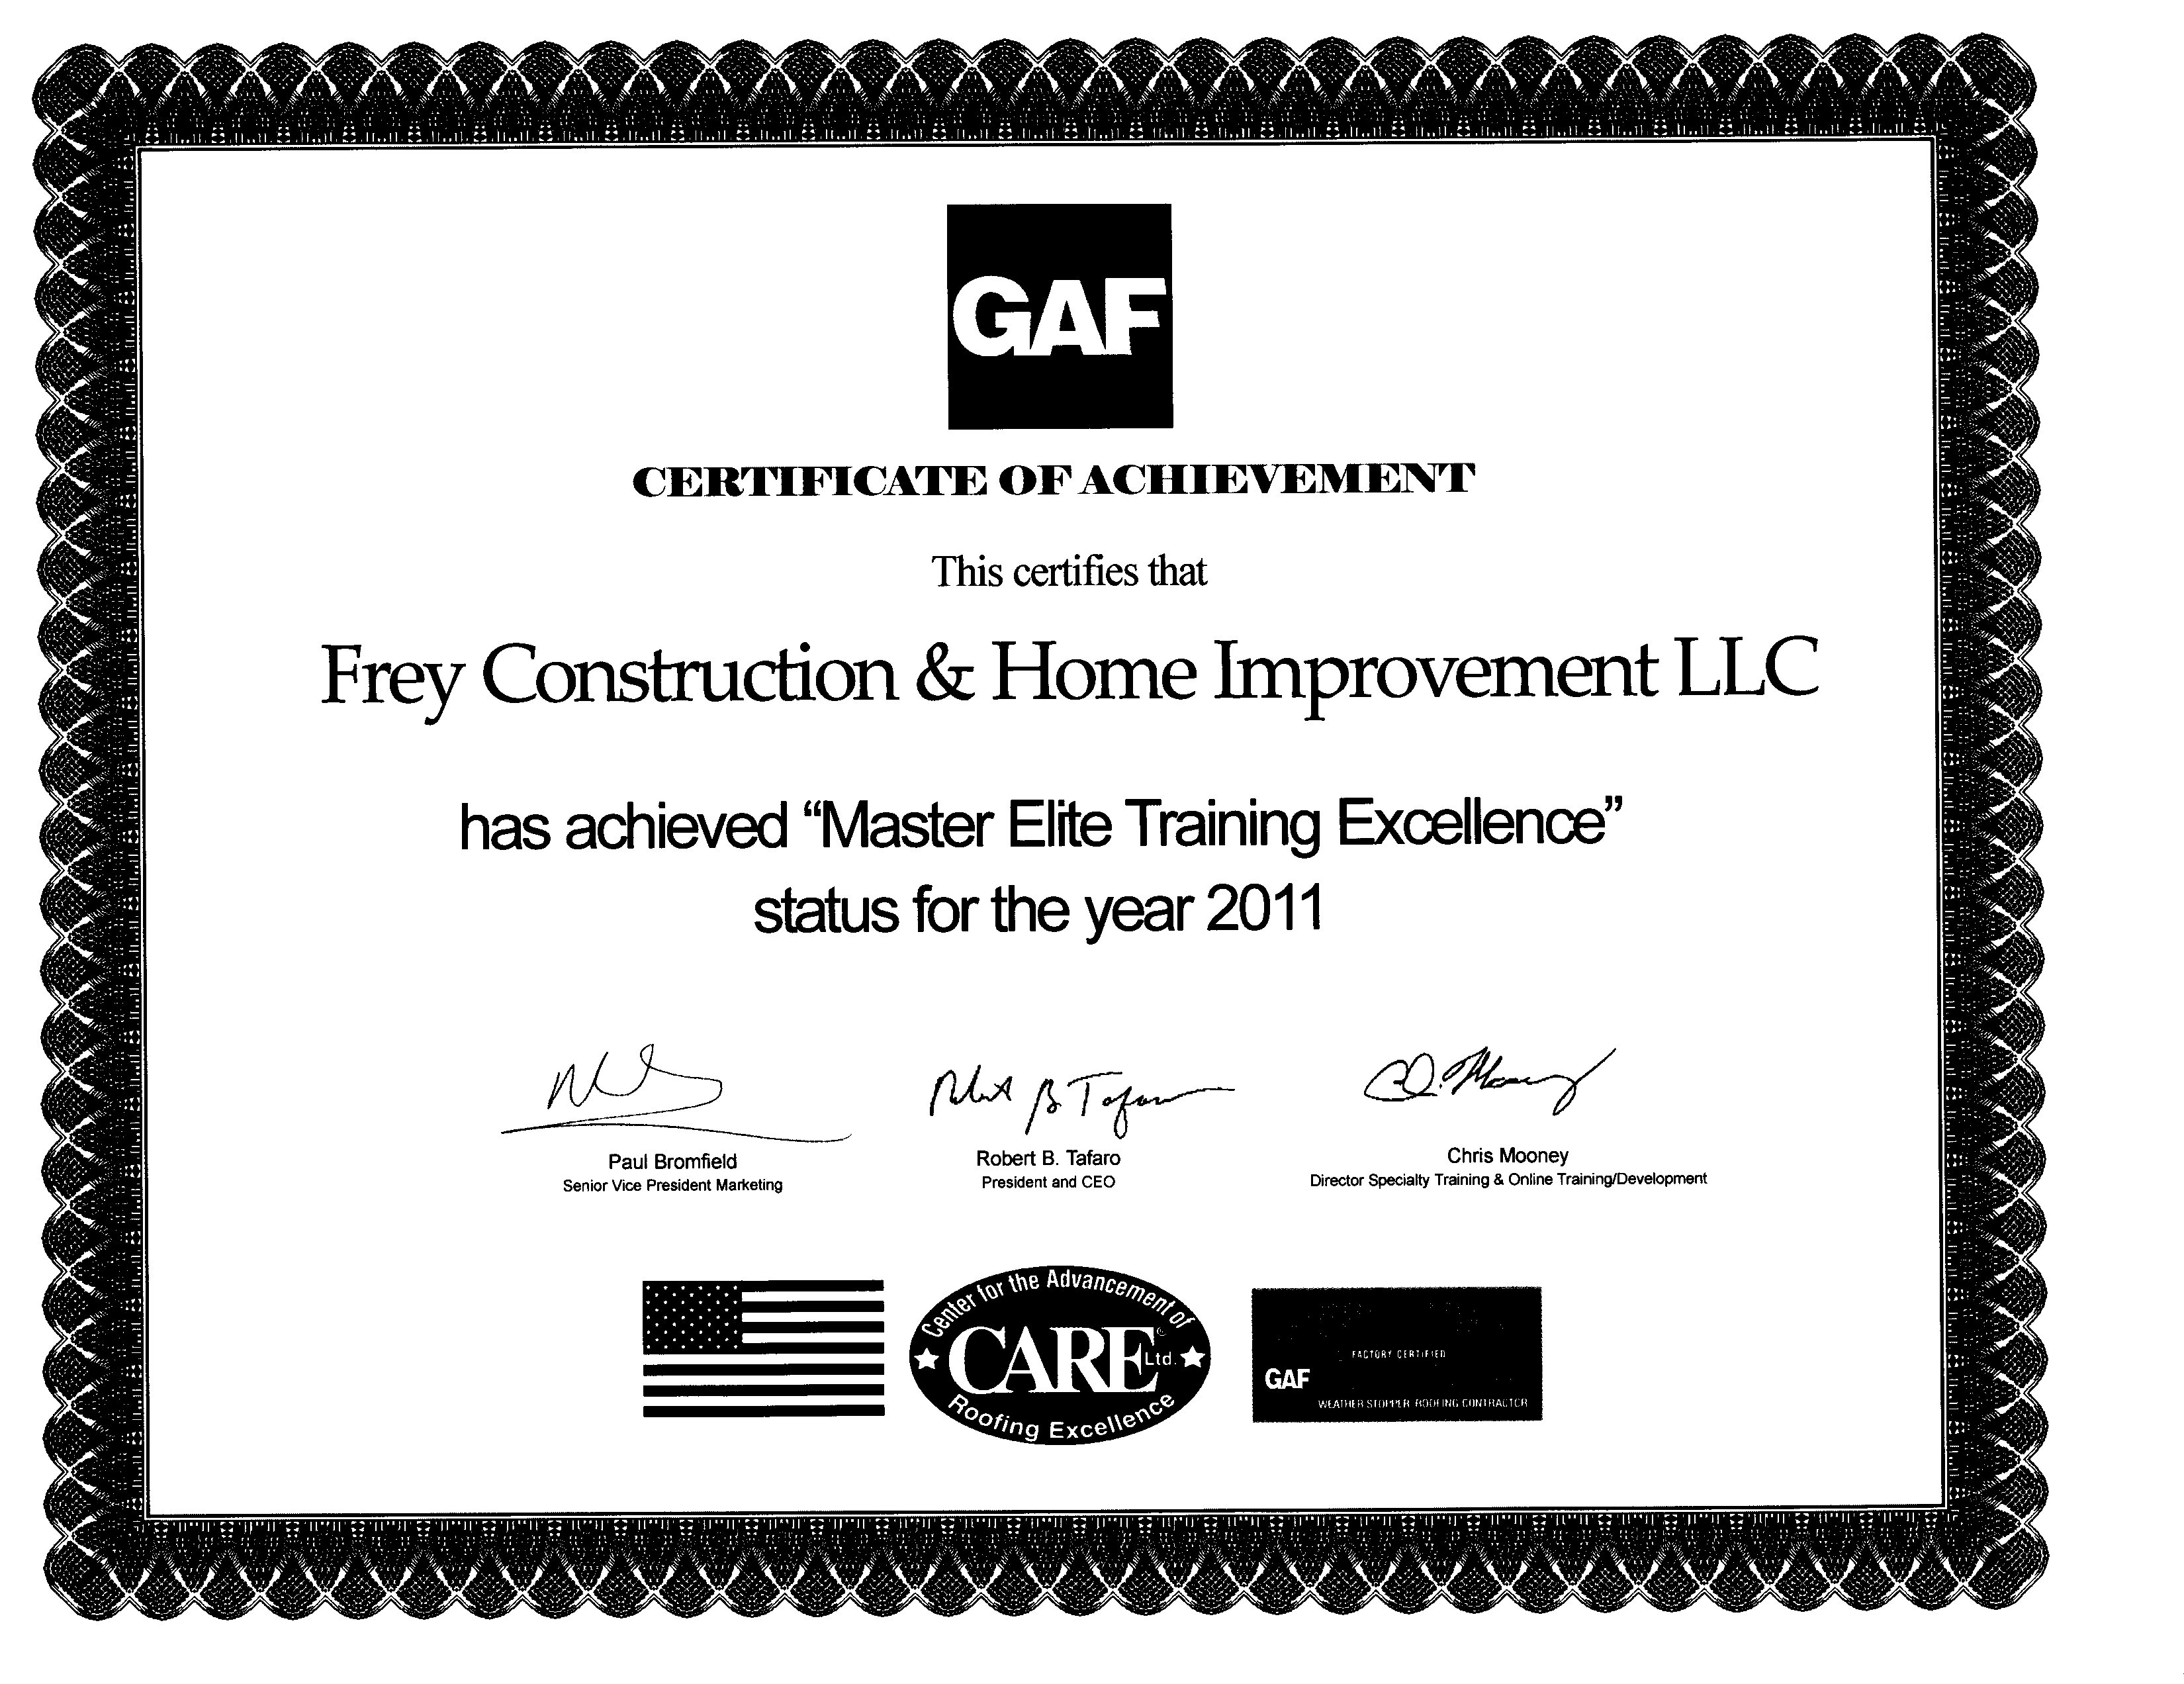 GAF Installation Excellence Award 2011